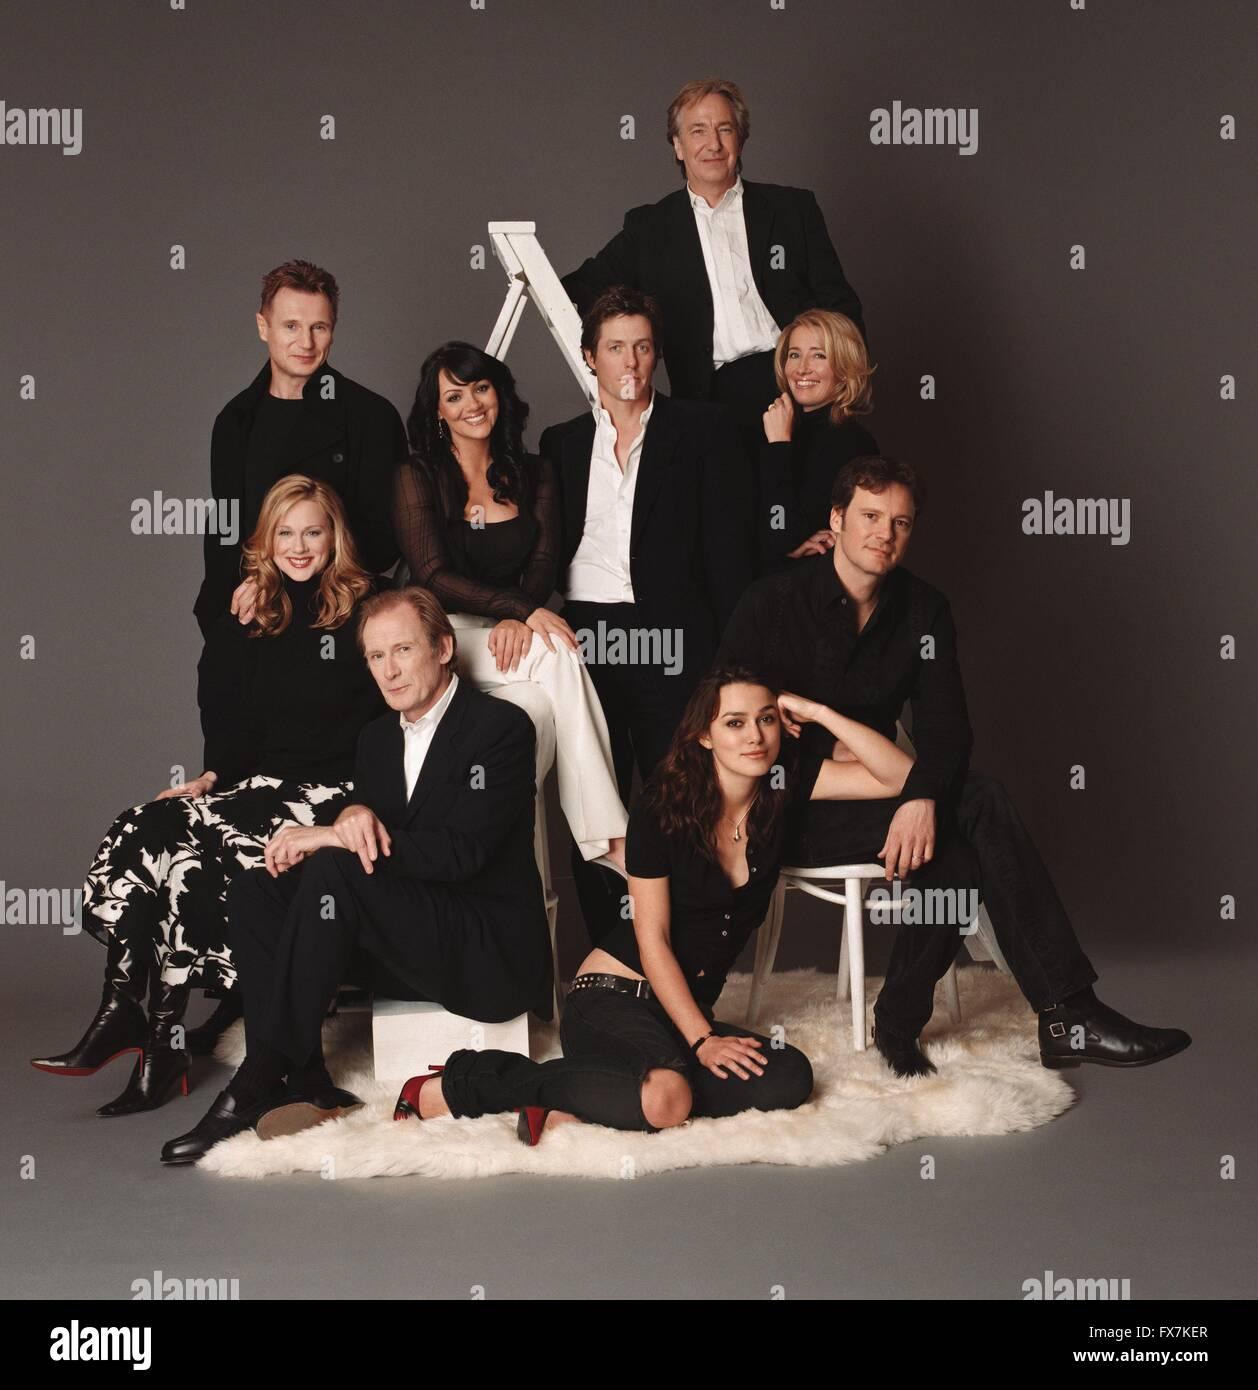 Love Actually Year : 2003 USA Director : : Richard Curtis Keira Knightley, Laura Linney, Bill Nighy, Hugh Grant, - Stock Image